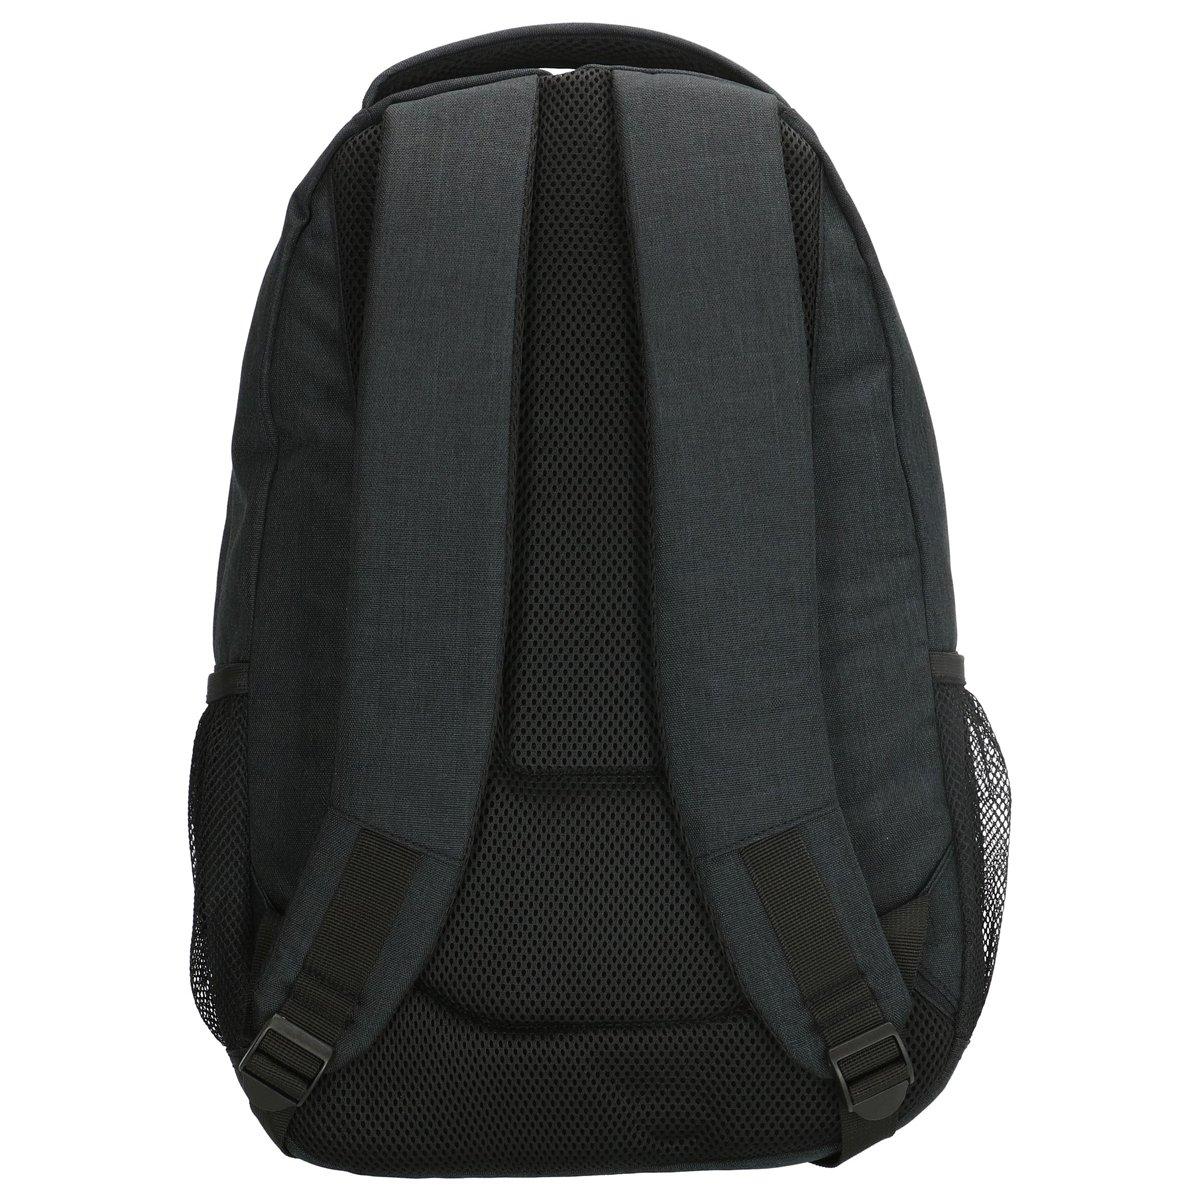 0cf021a253a Enrico Benetti [Q1789] - Backpack 'Enrico benetti' Black (Special Computer  15.6)- 45x31x19 cm (17.72''x12.20''x7.48'').: Amazon.co.uk: Luggage